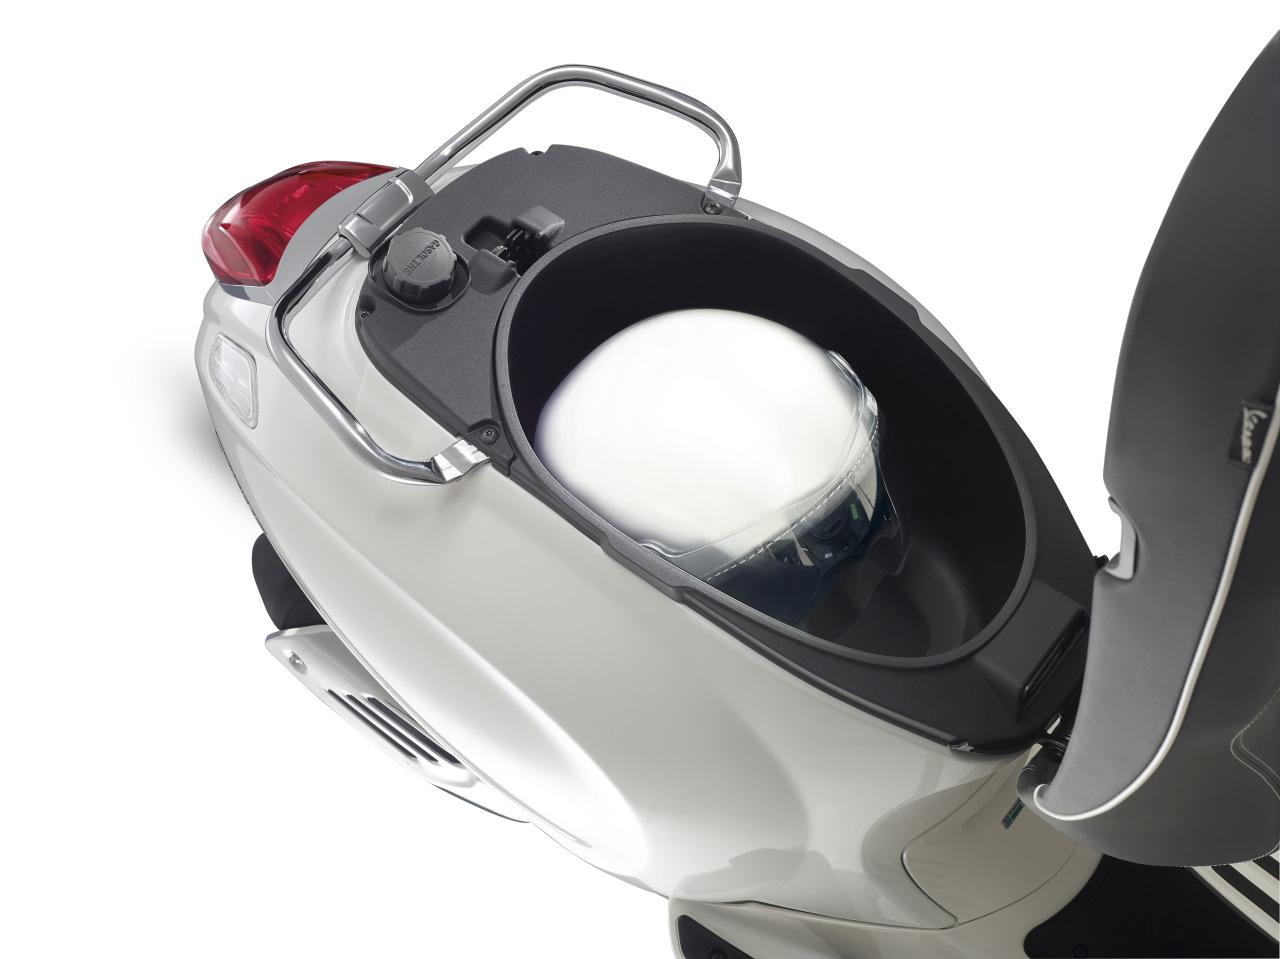 essai du scooter vespa 125 sprint photo 5 l 39 argus. Black Bedroom Furniture Sets. Home Design Ideas